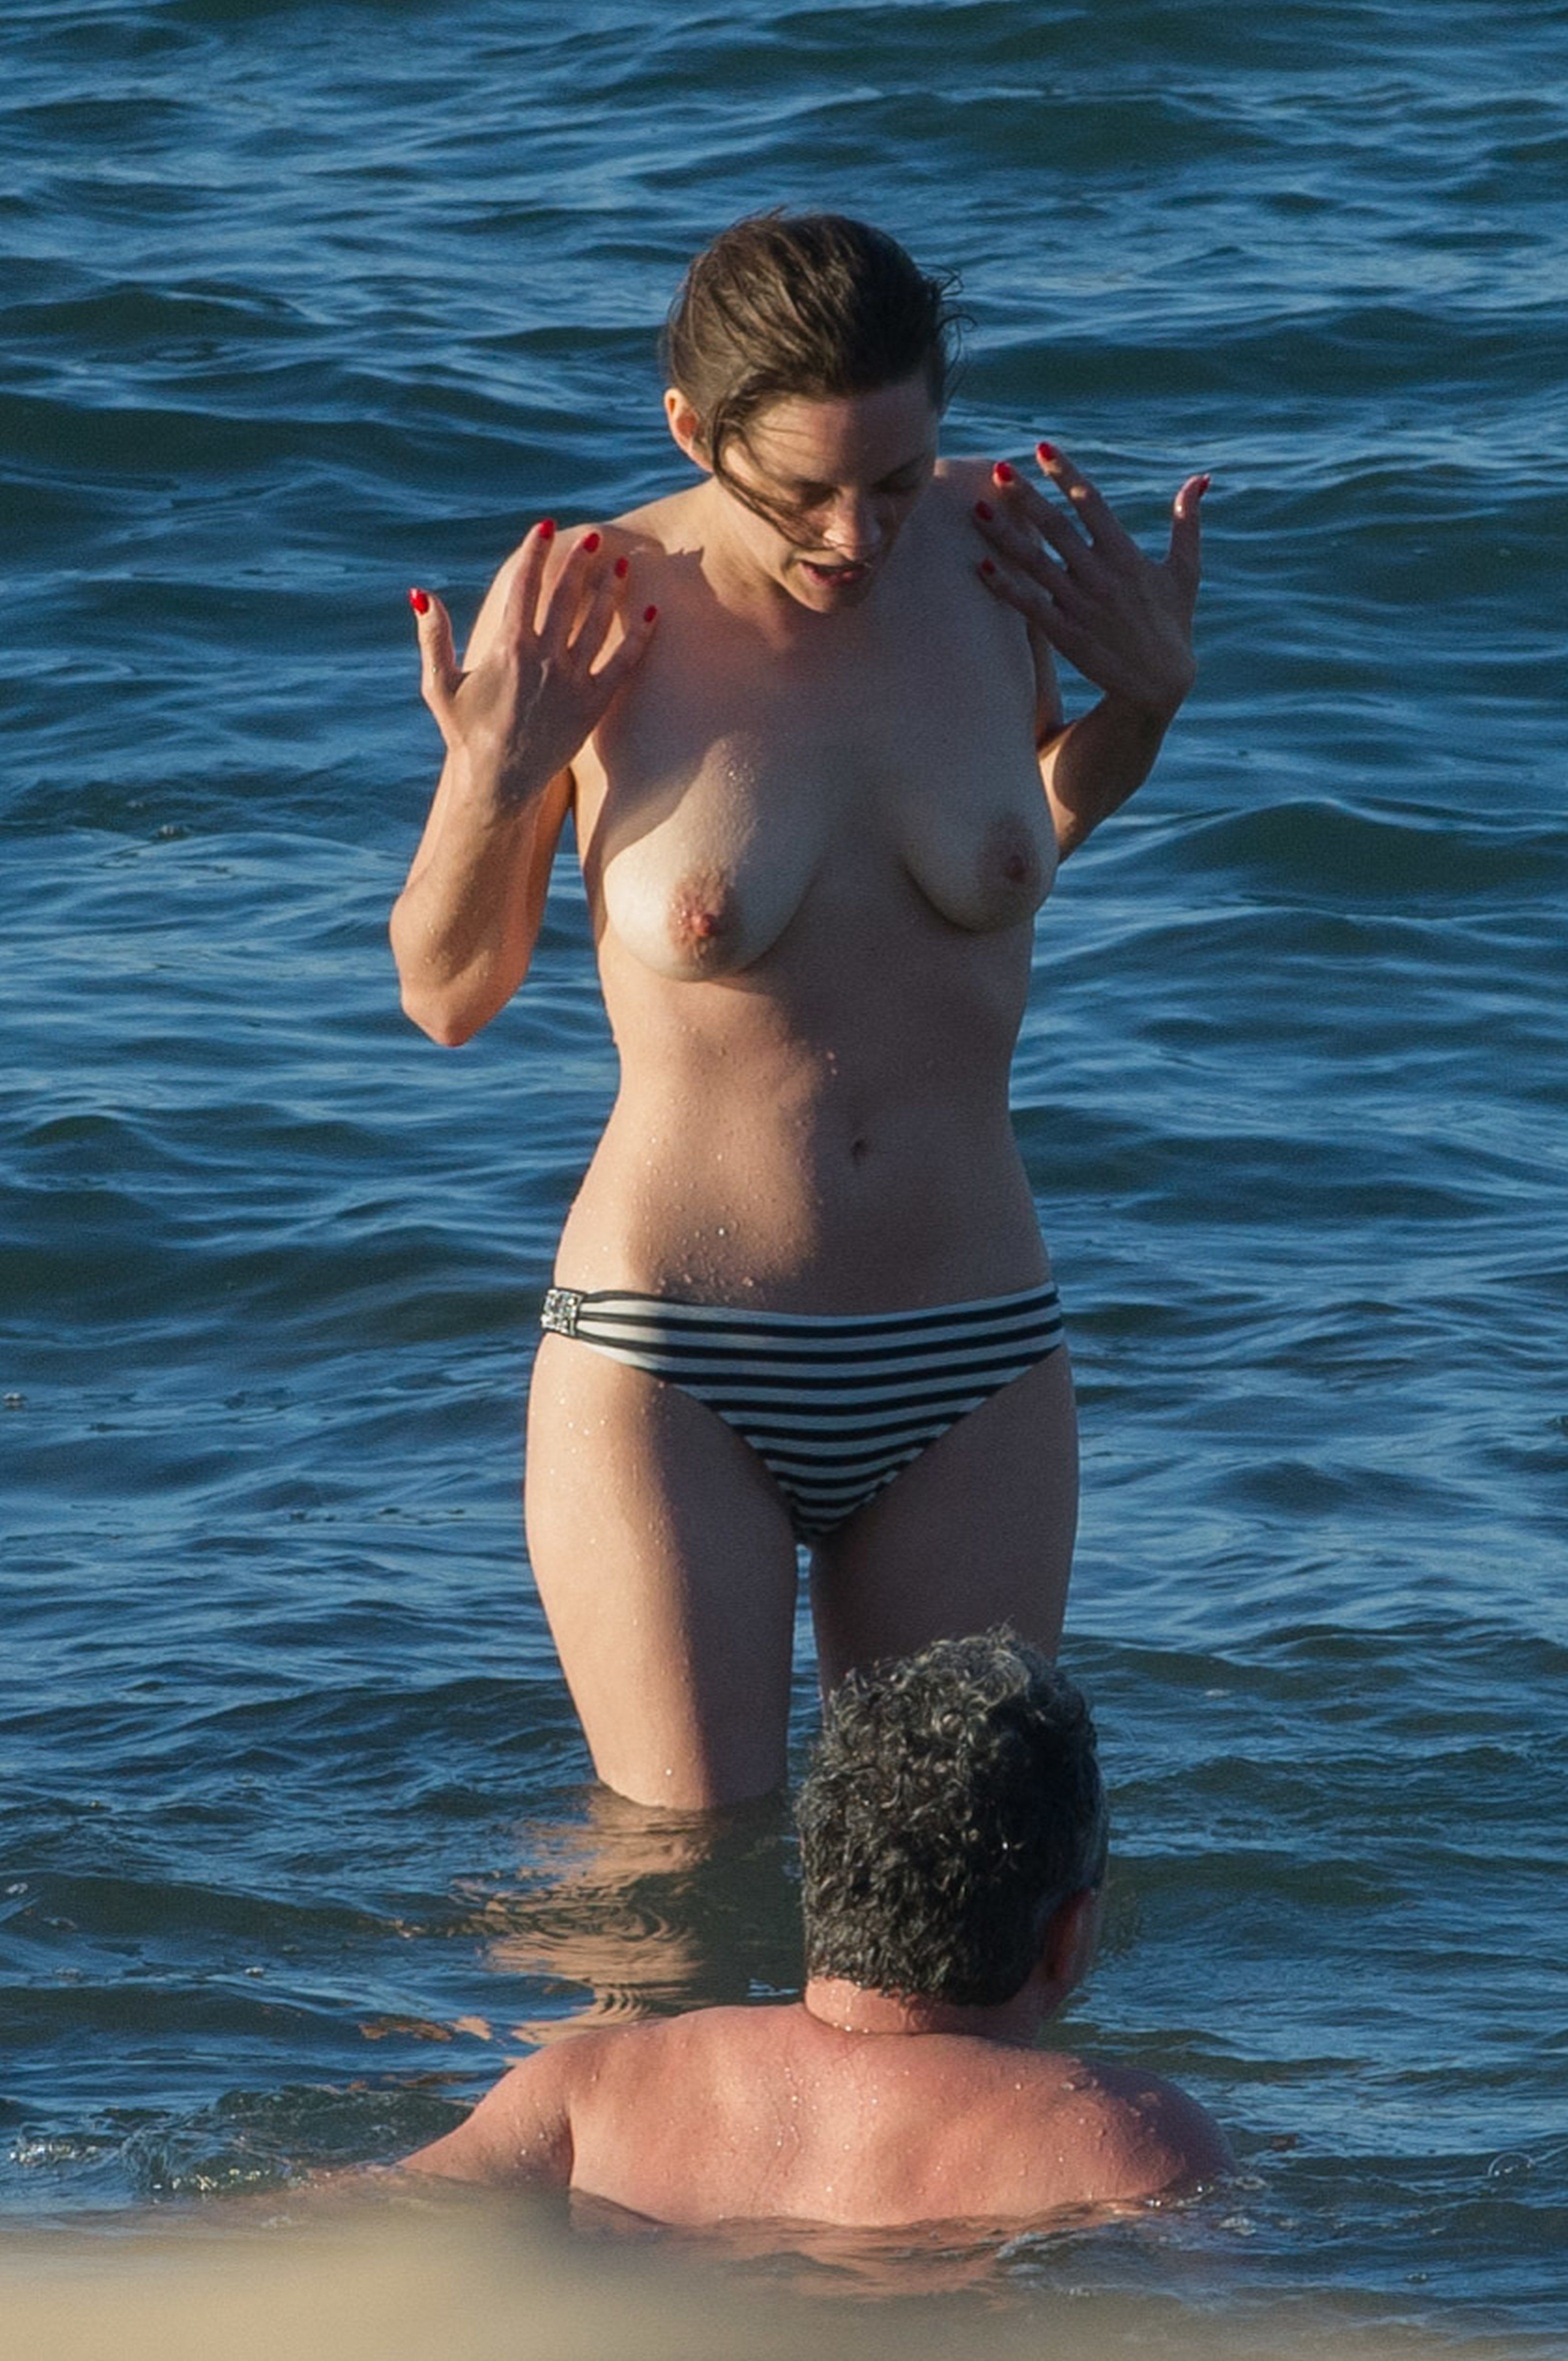 Marion-Cotillard-Topless-1